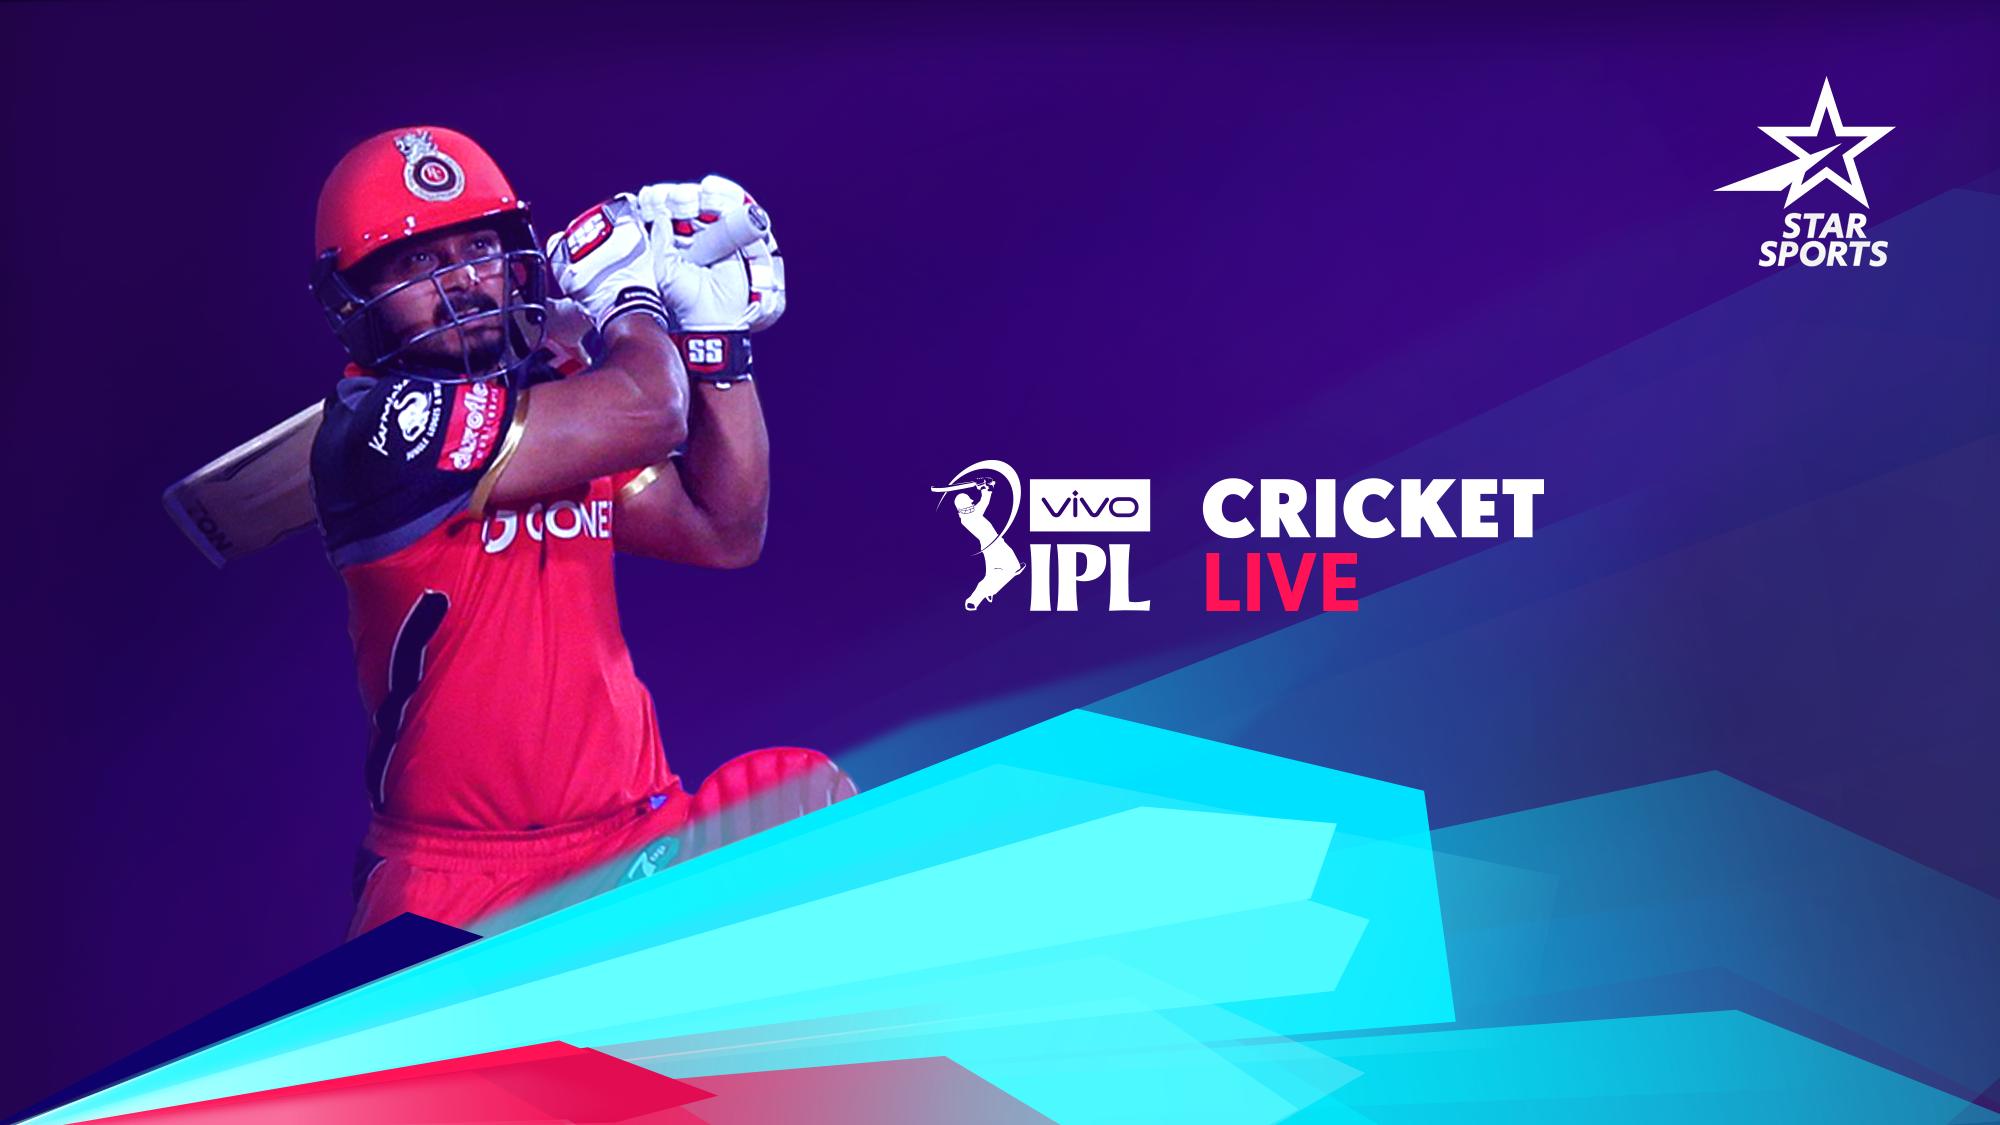 Addikt_IPL_header-1.png